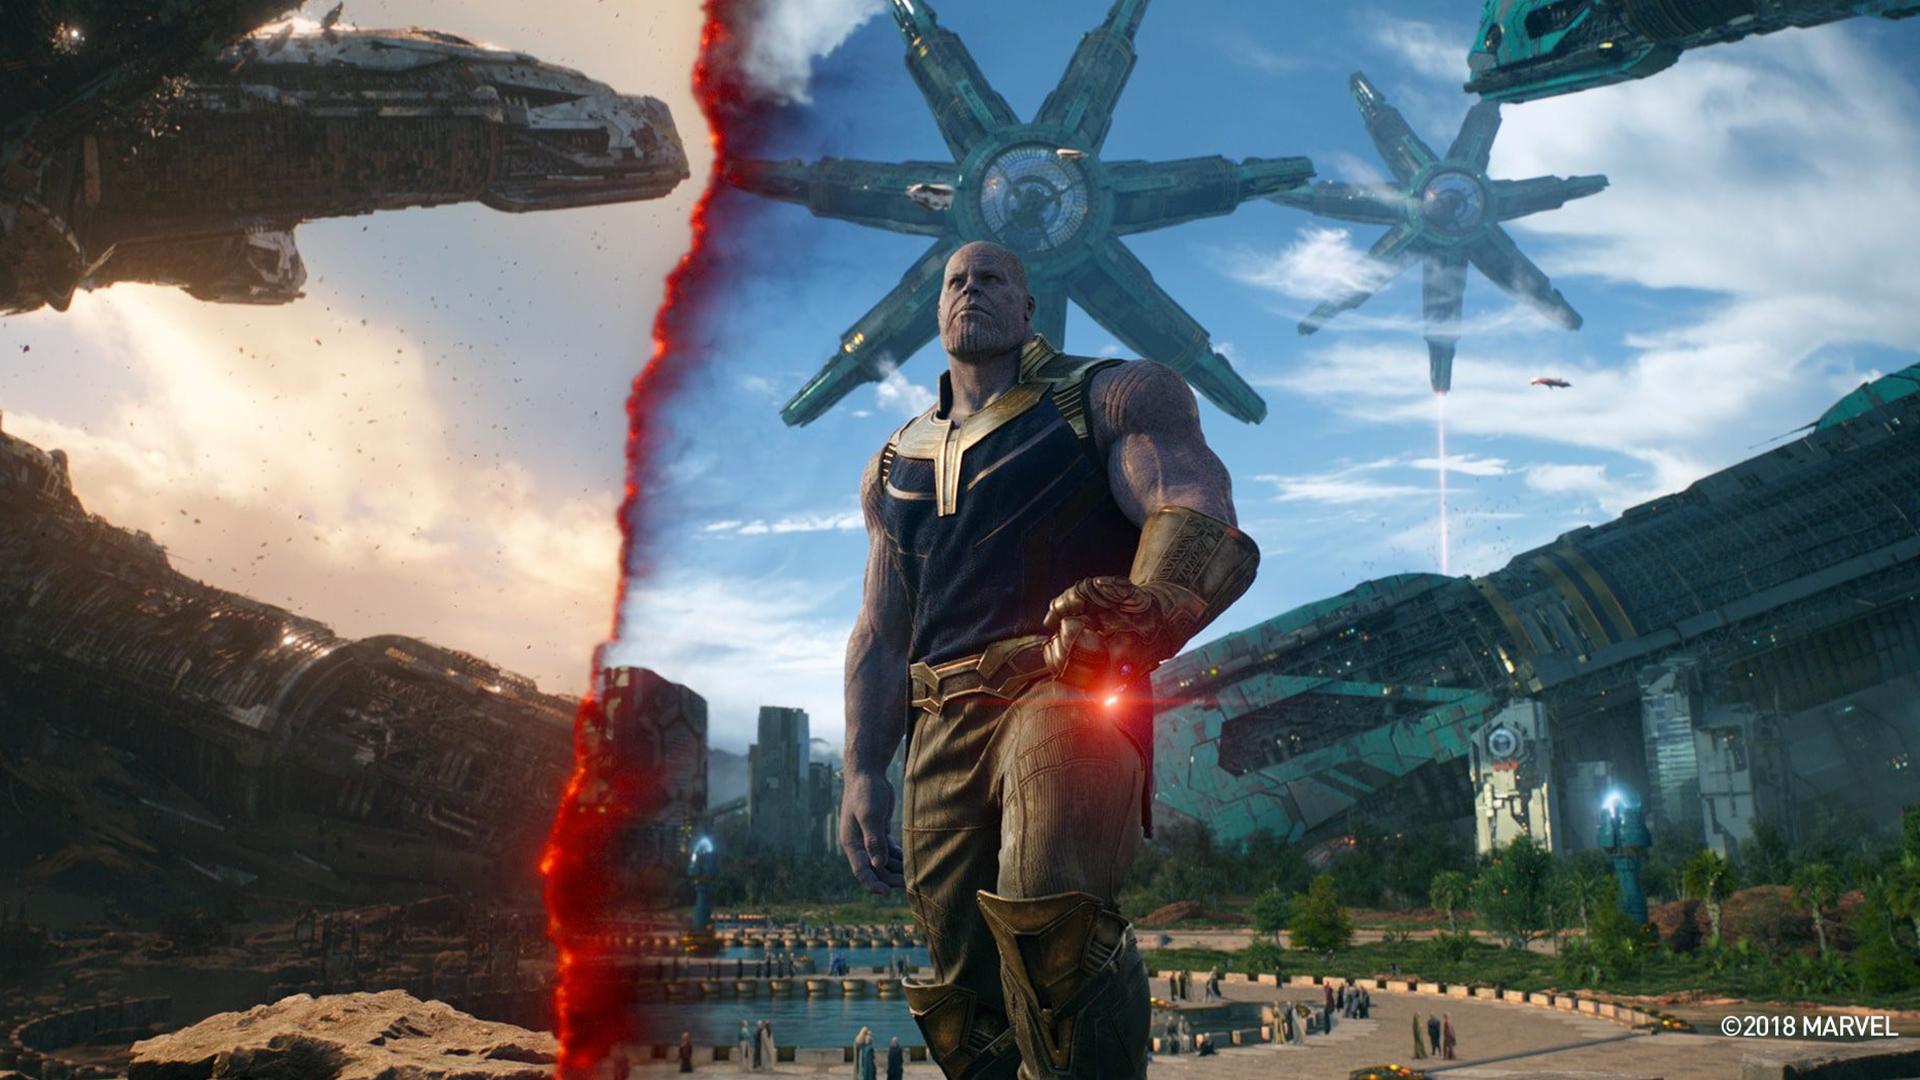 Hd Wallpaper Thanos In Avengers Infinity War 2018 Movie Hd